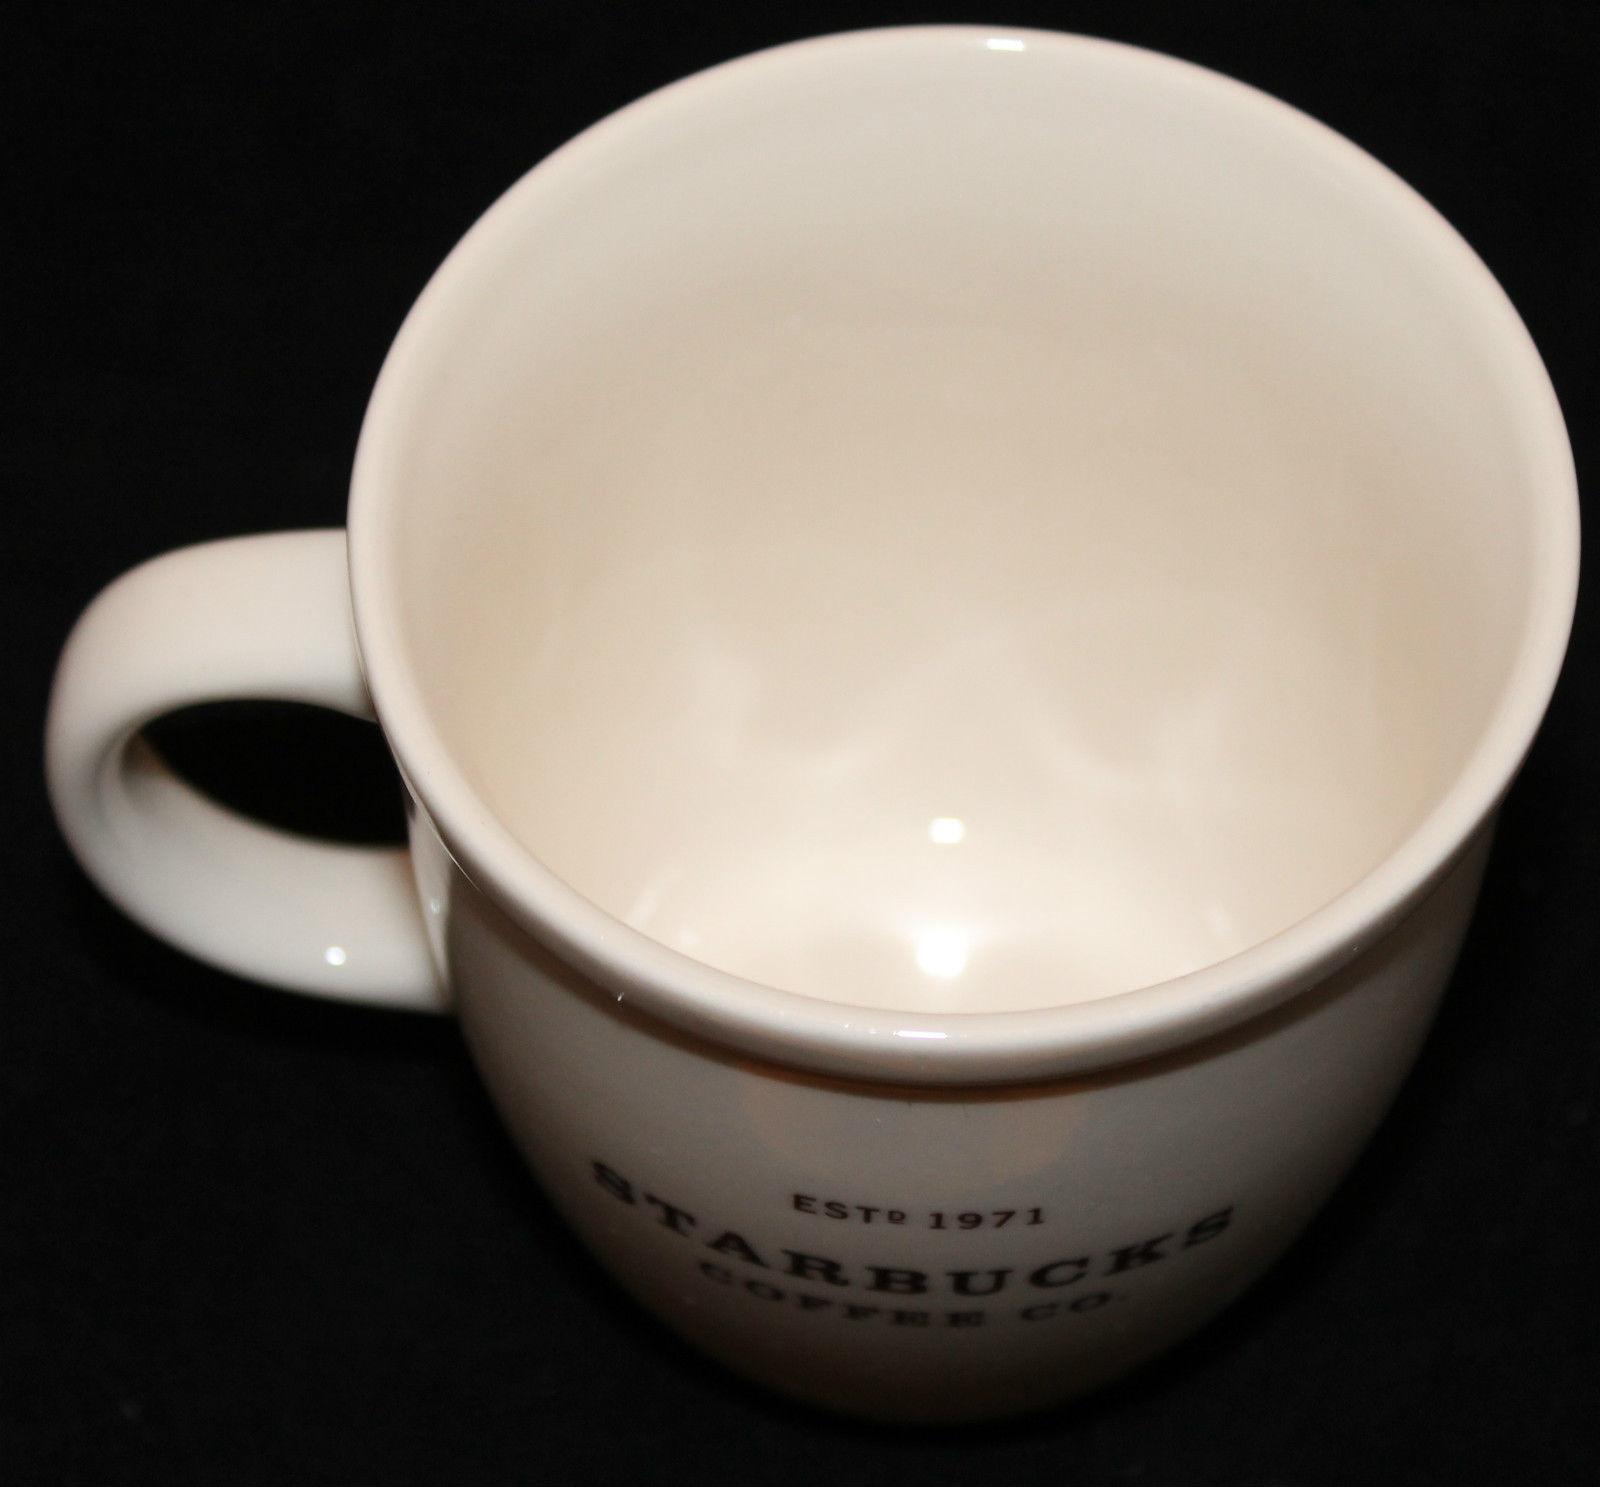 Starbucks Coffee 2006 White Estd 1971 16 oz Coffee Tea Mug Cup